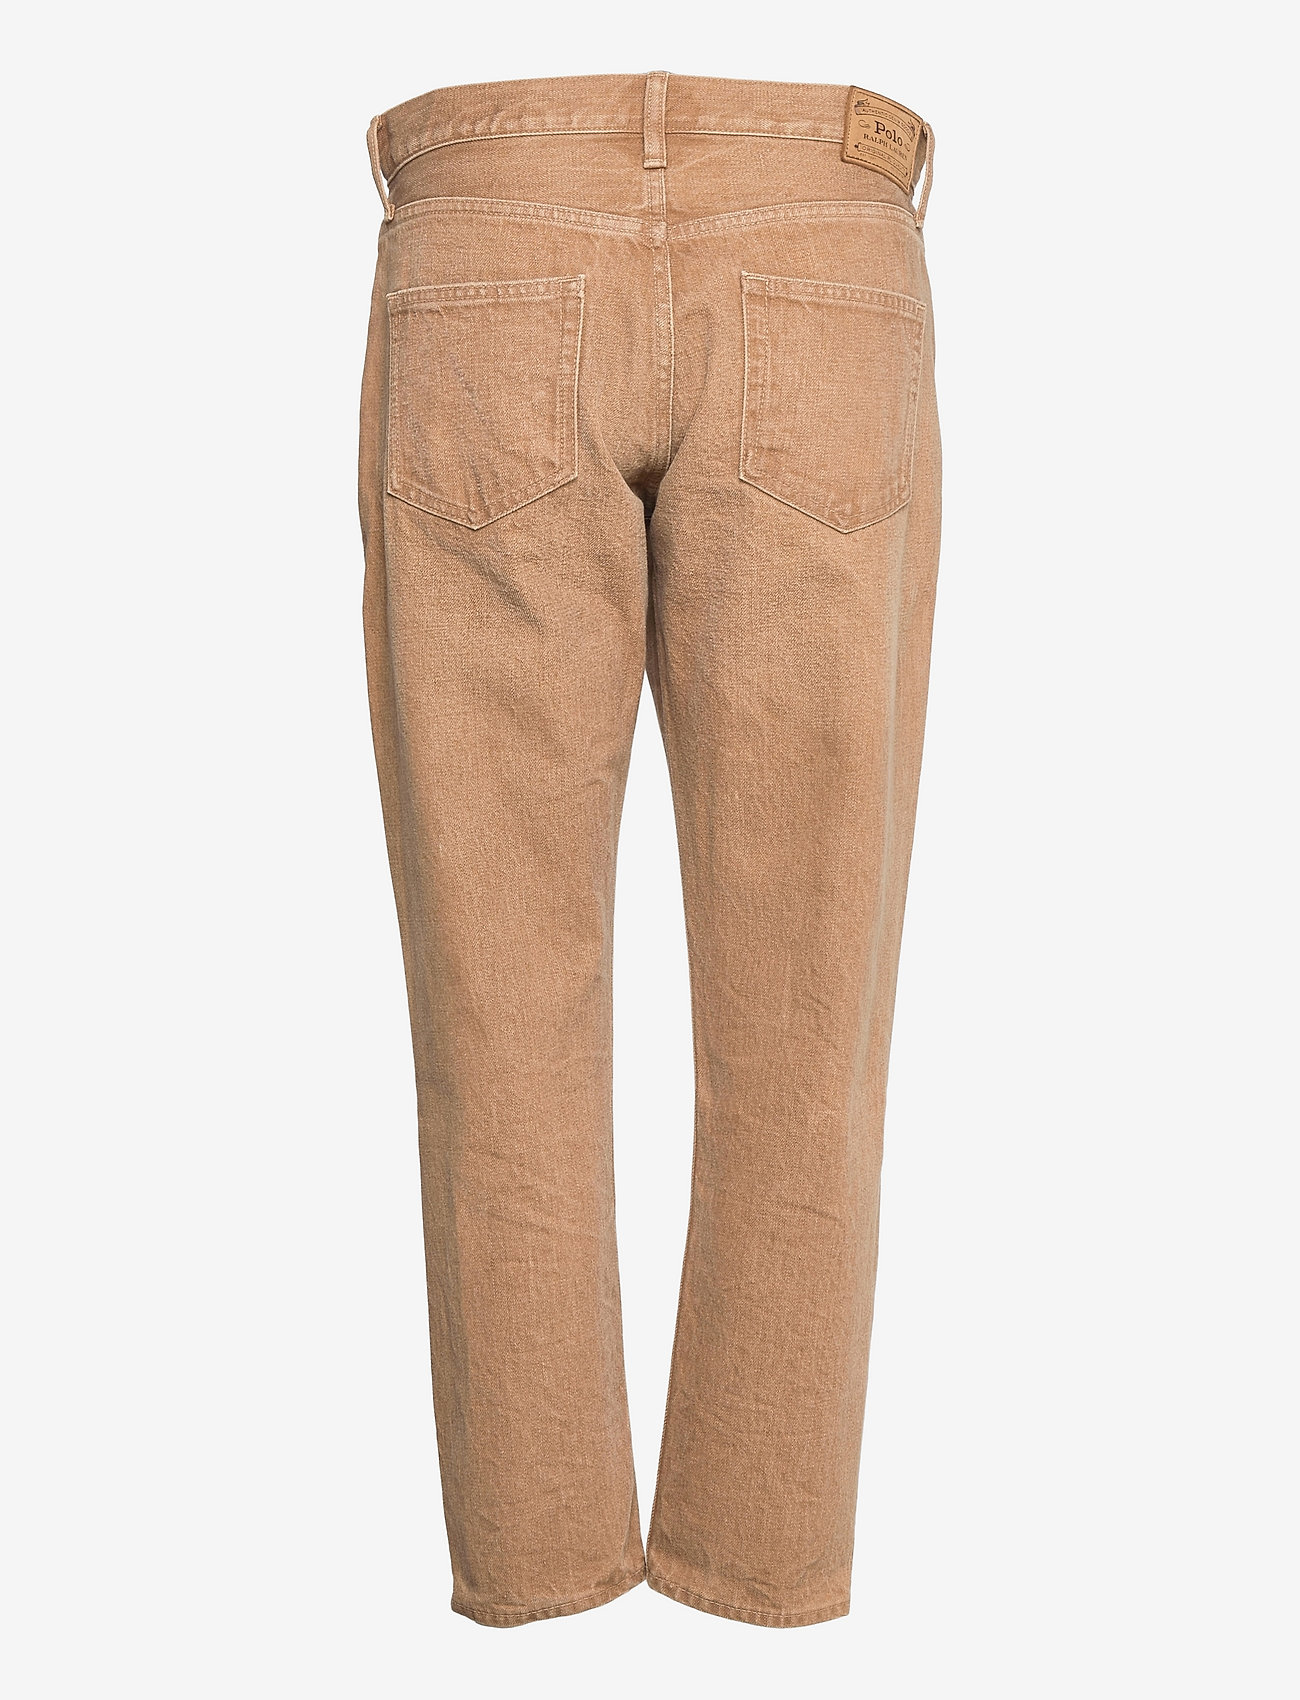 Polo Ralph Lauren - AVERY BF-DENIM - straight jeans - light brown - 1